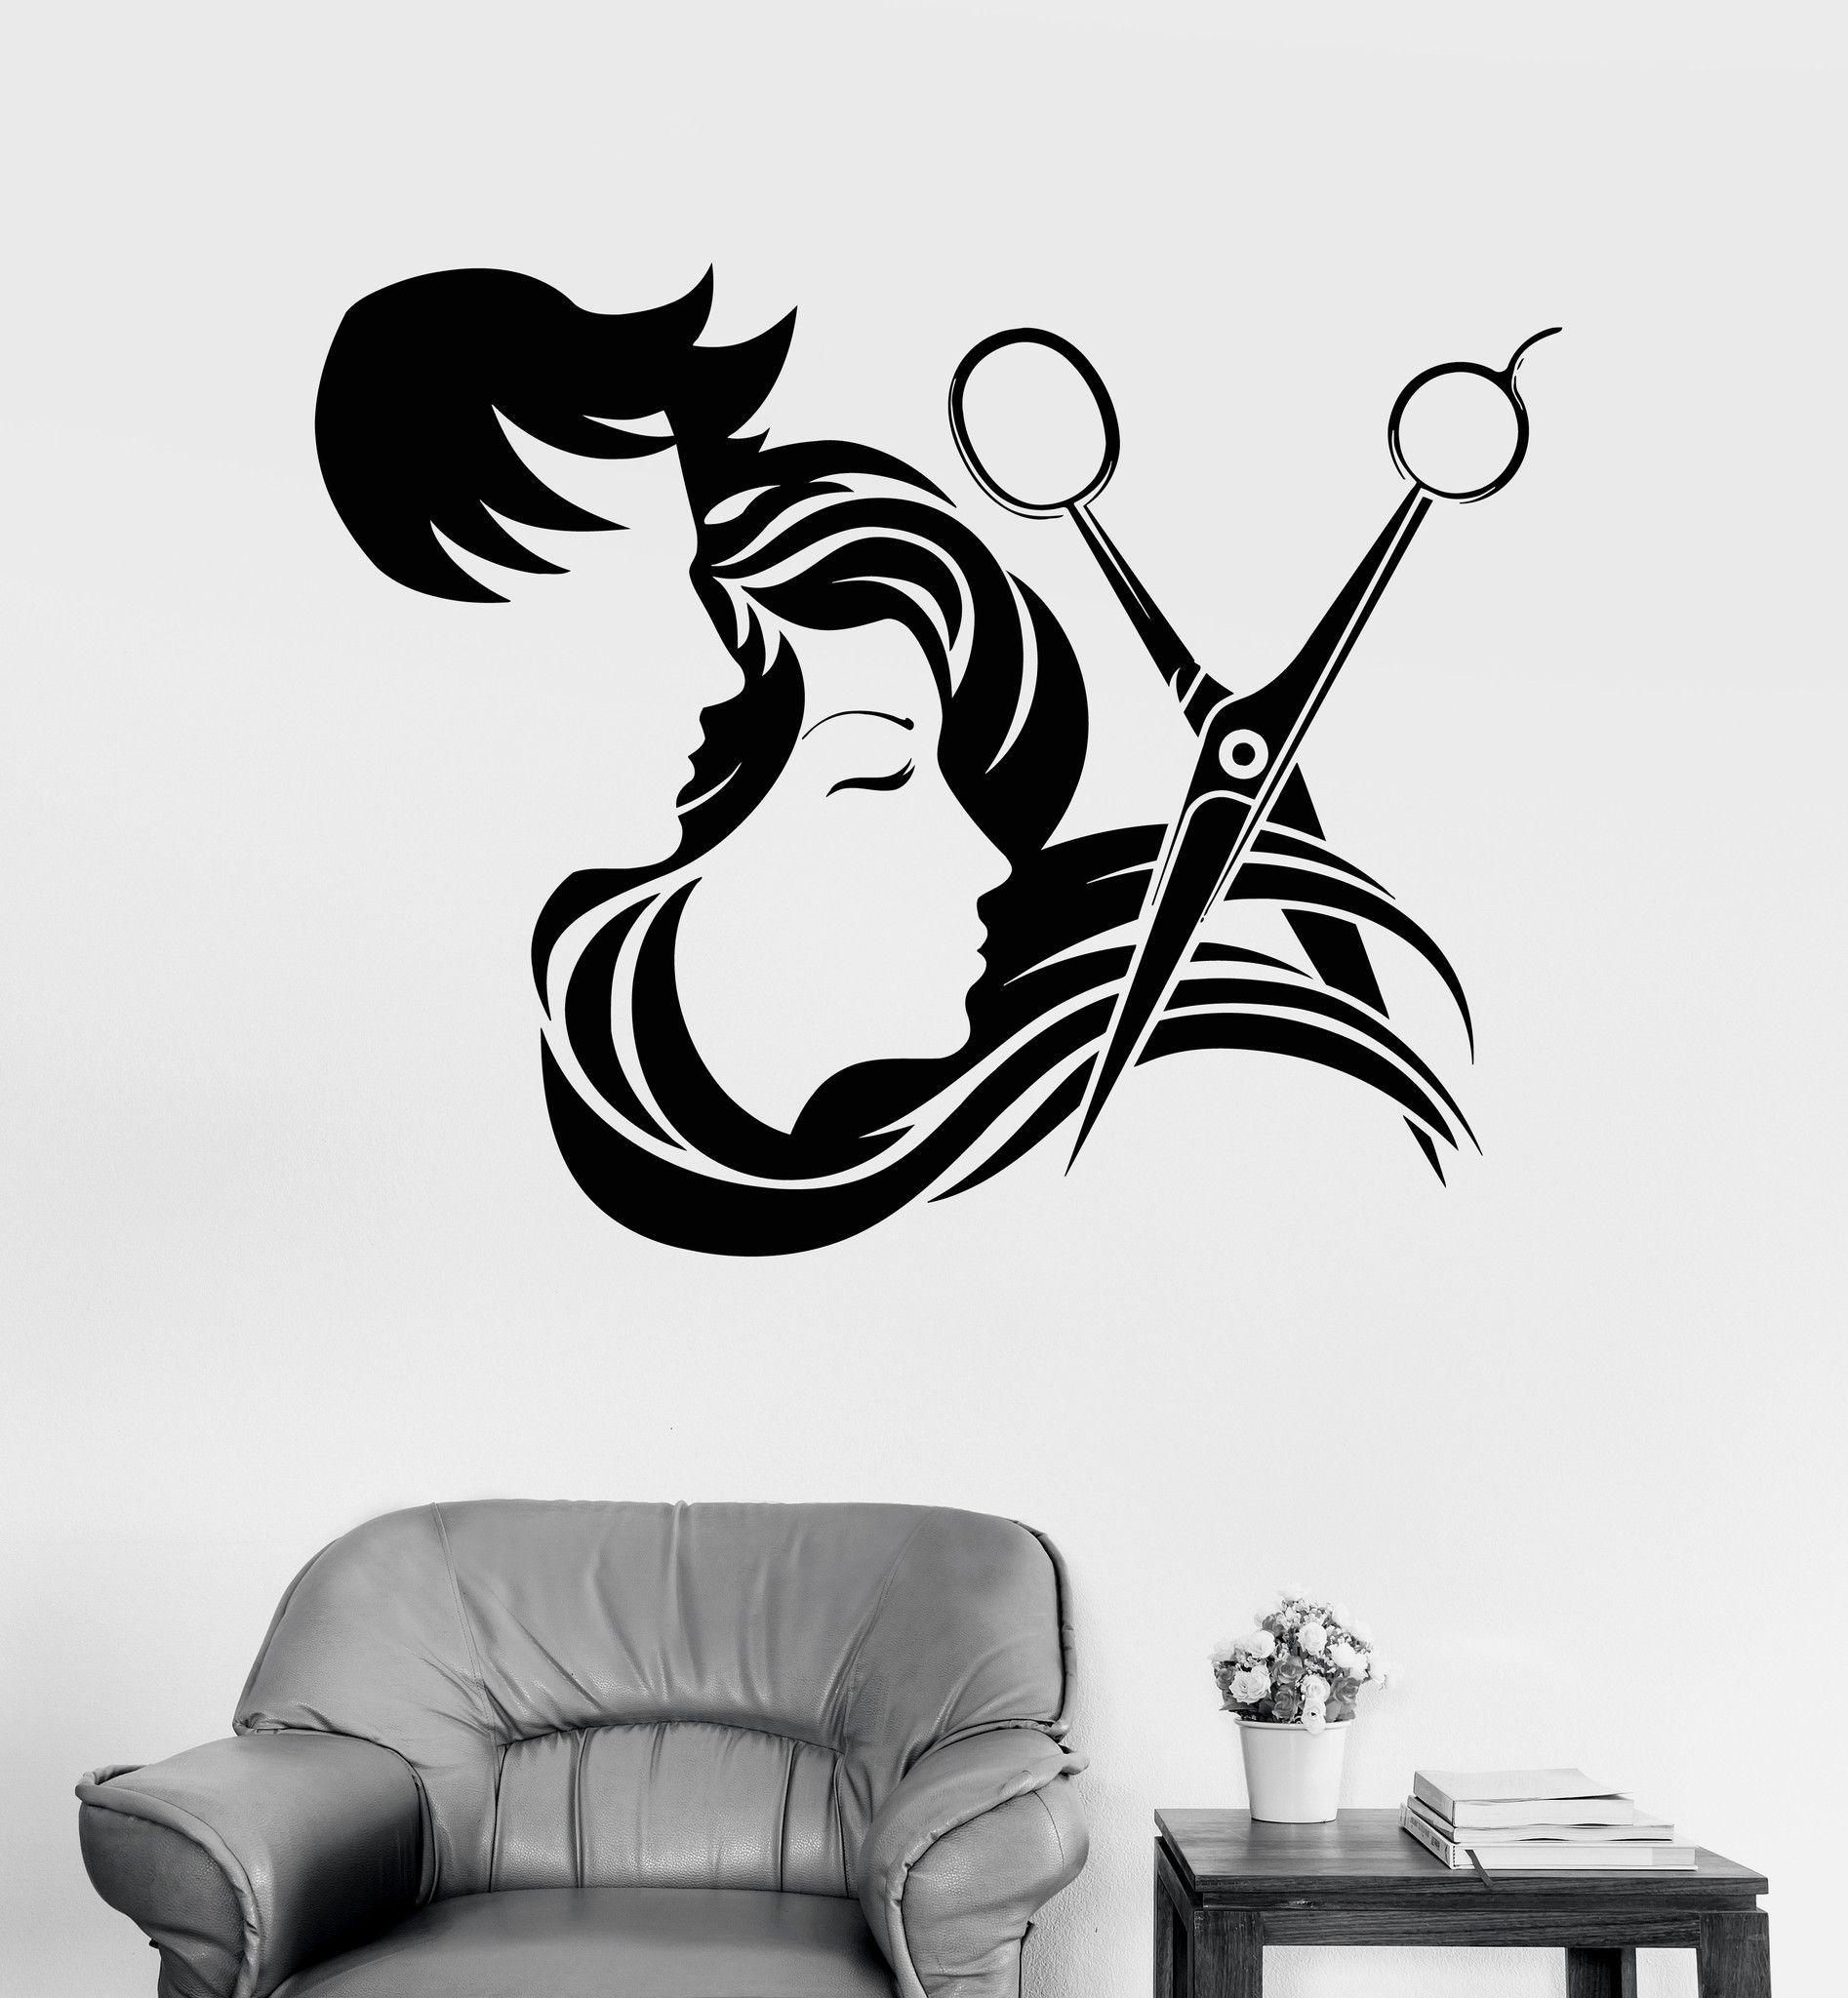 Vinyl wall decal hair salon stylist hairdresser barber shop stickers unique gift ig4133 - Stickers salon design ...